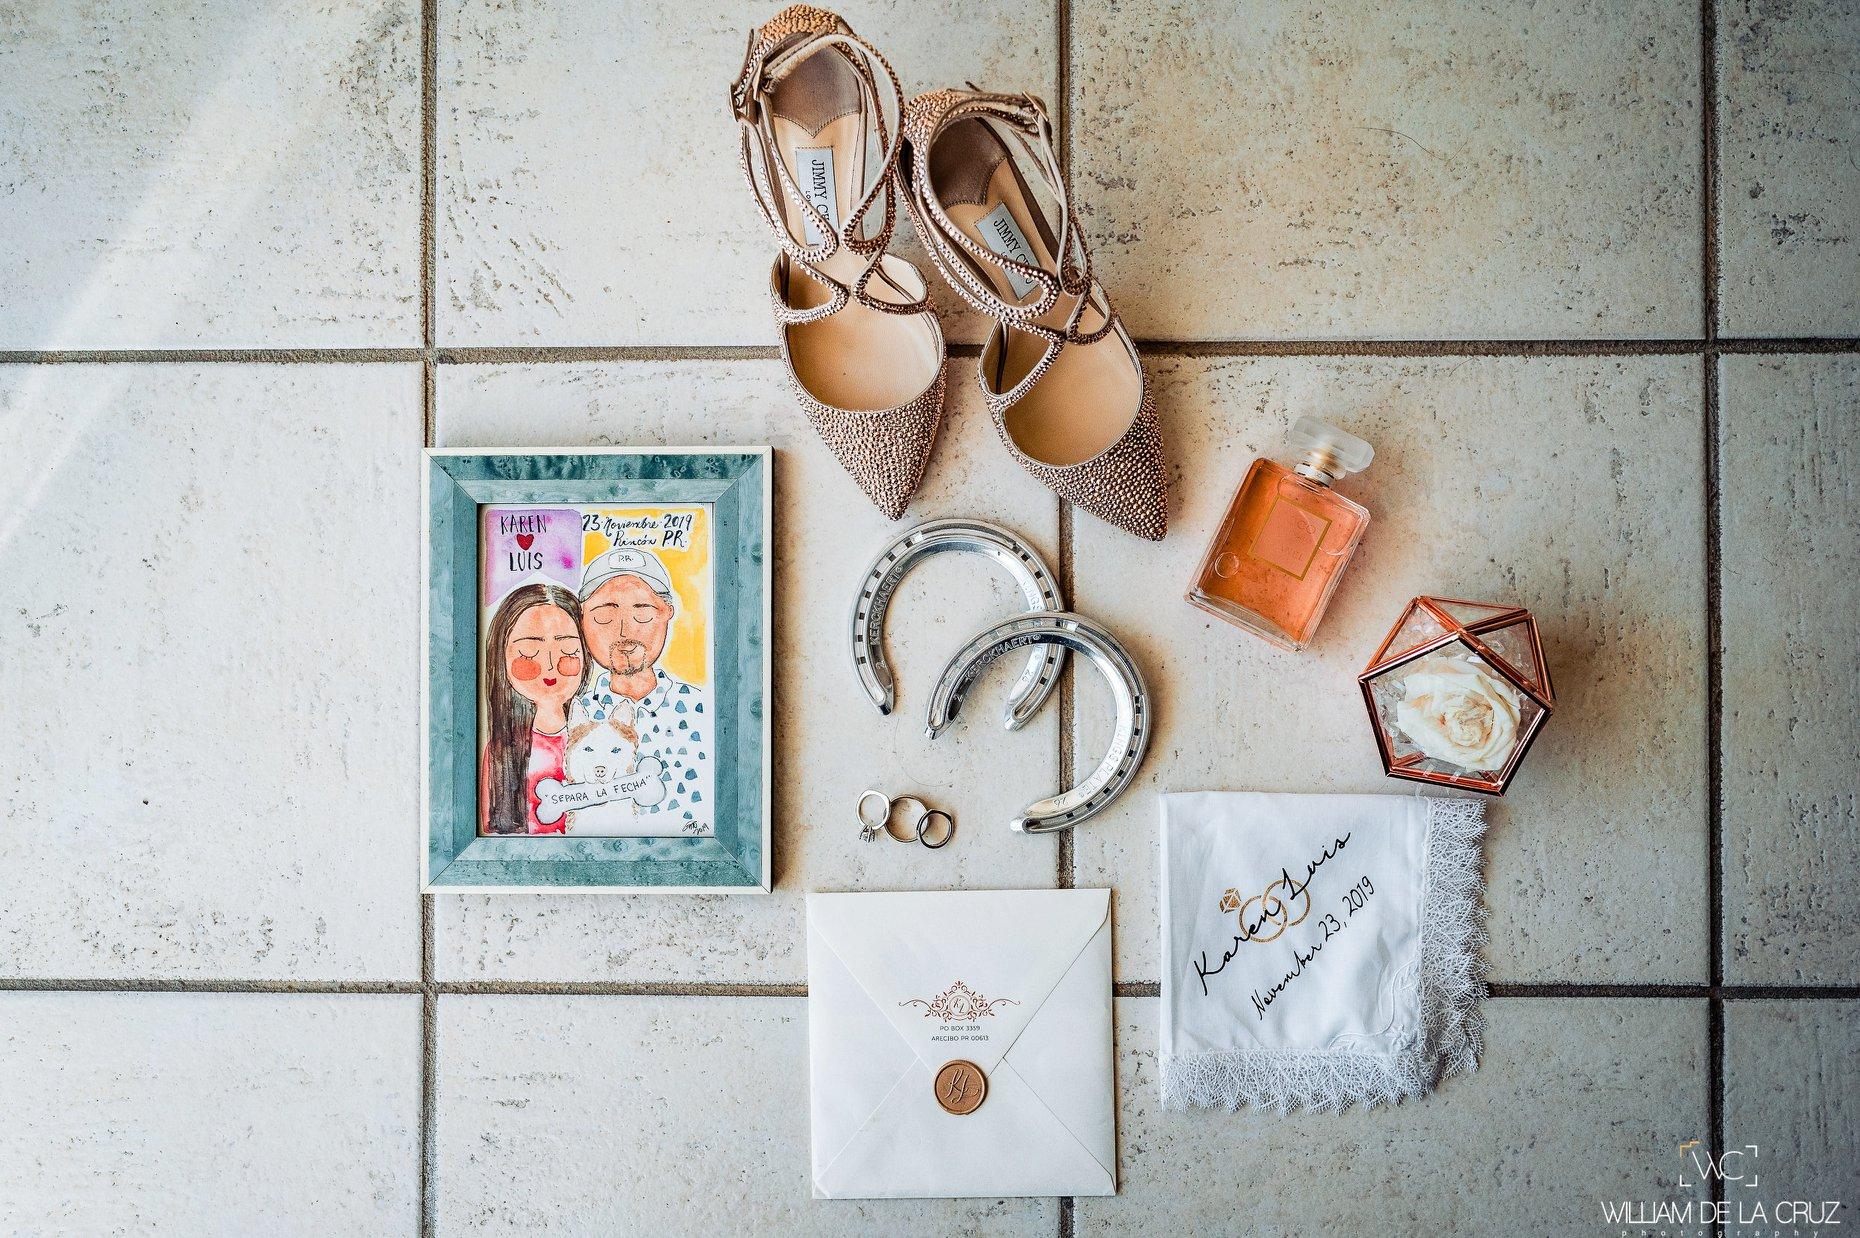 Invitaciones: Paper Crafts (William De La Cruz)